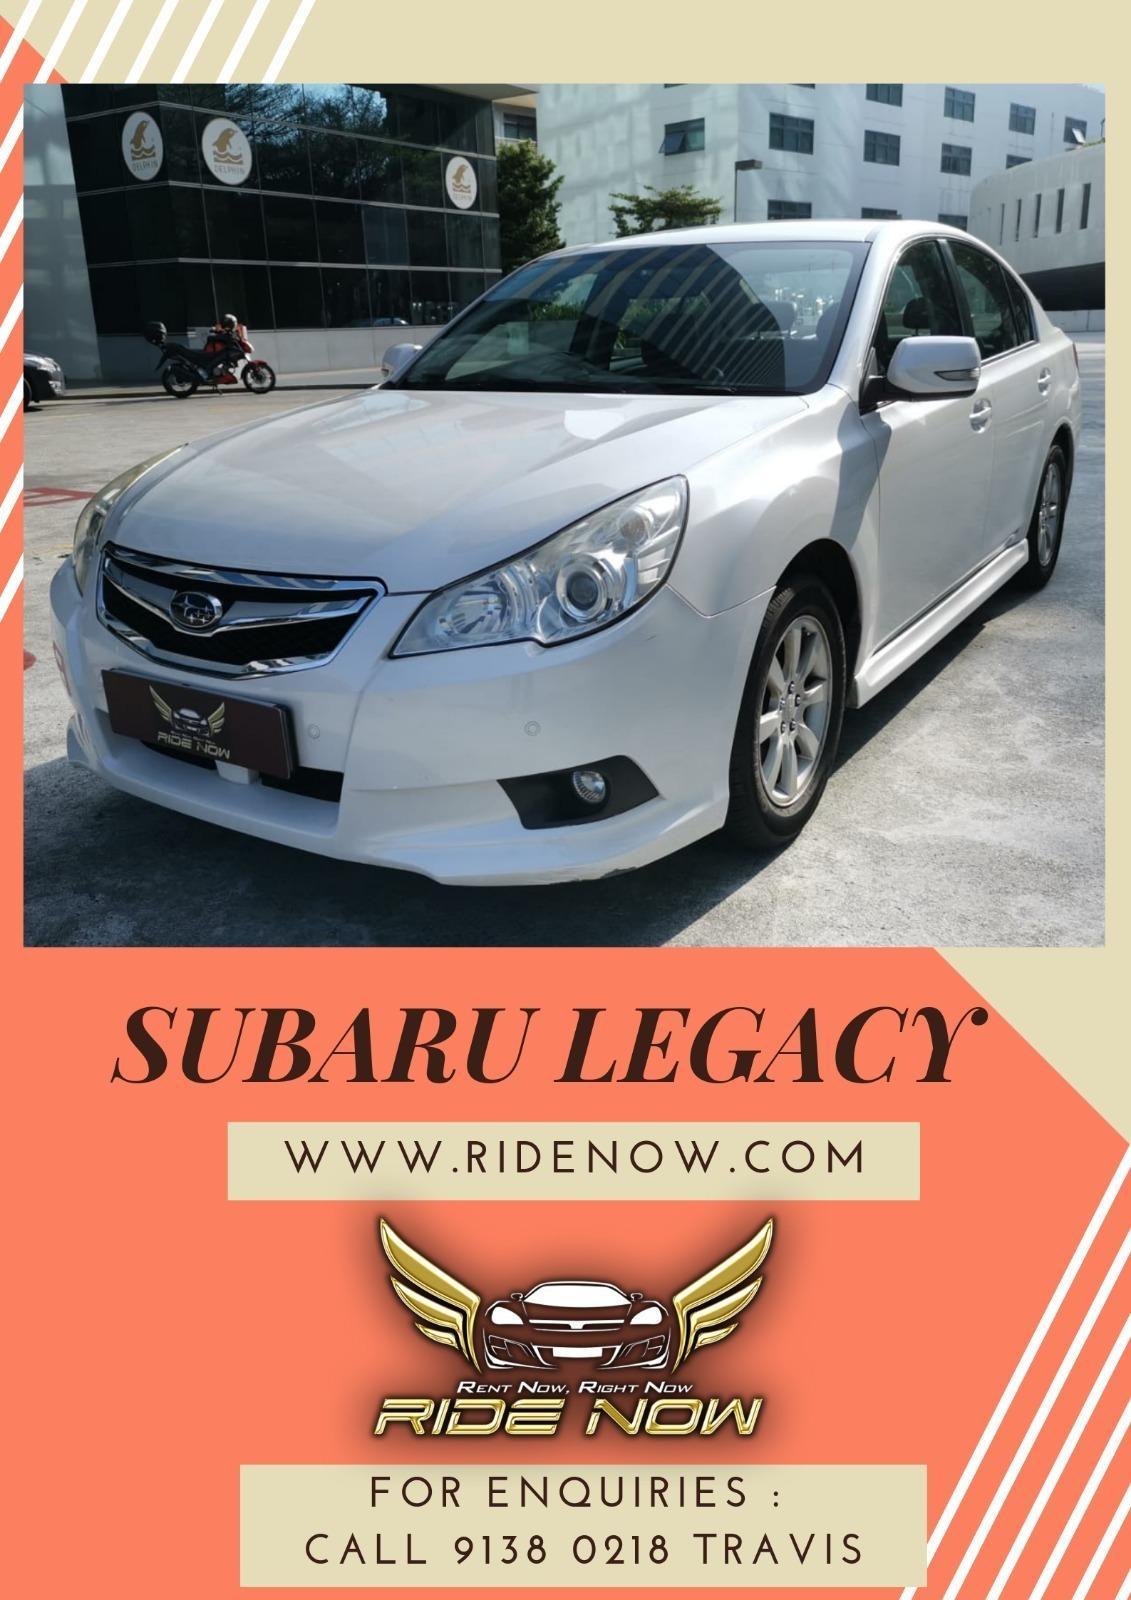 Subaru Legacy 2.0A Sedan Smooth luxurious sedan good for long driving trips